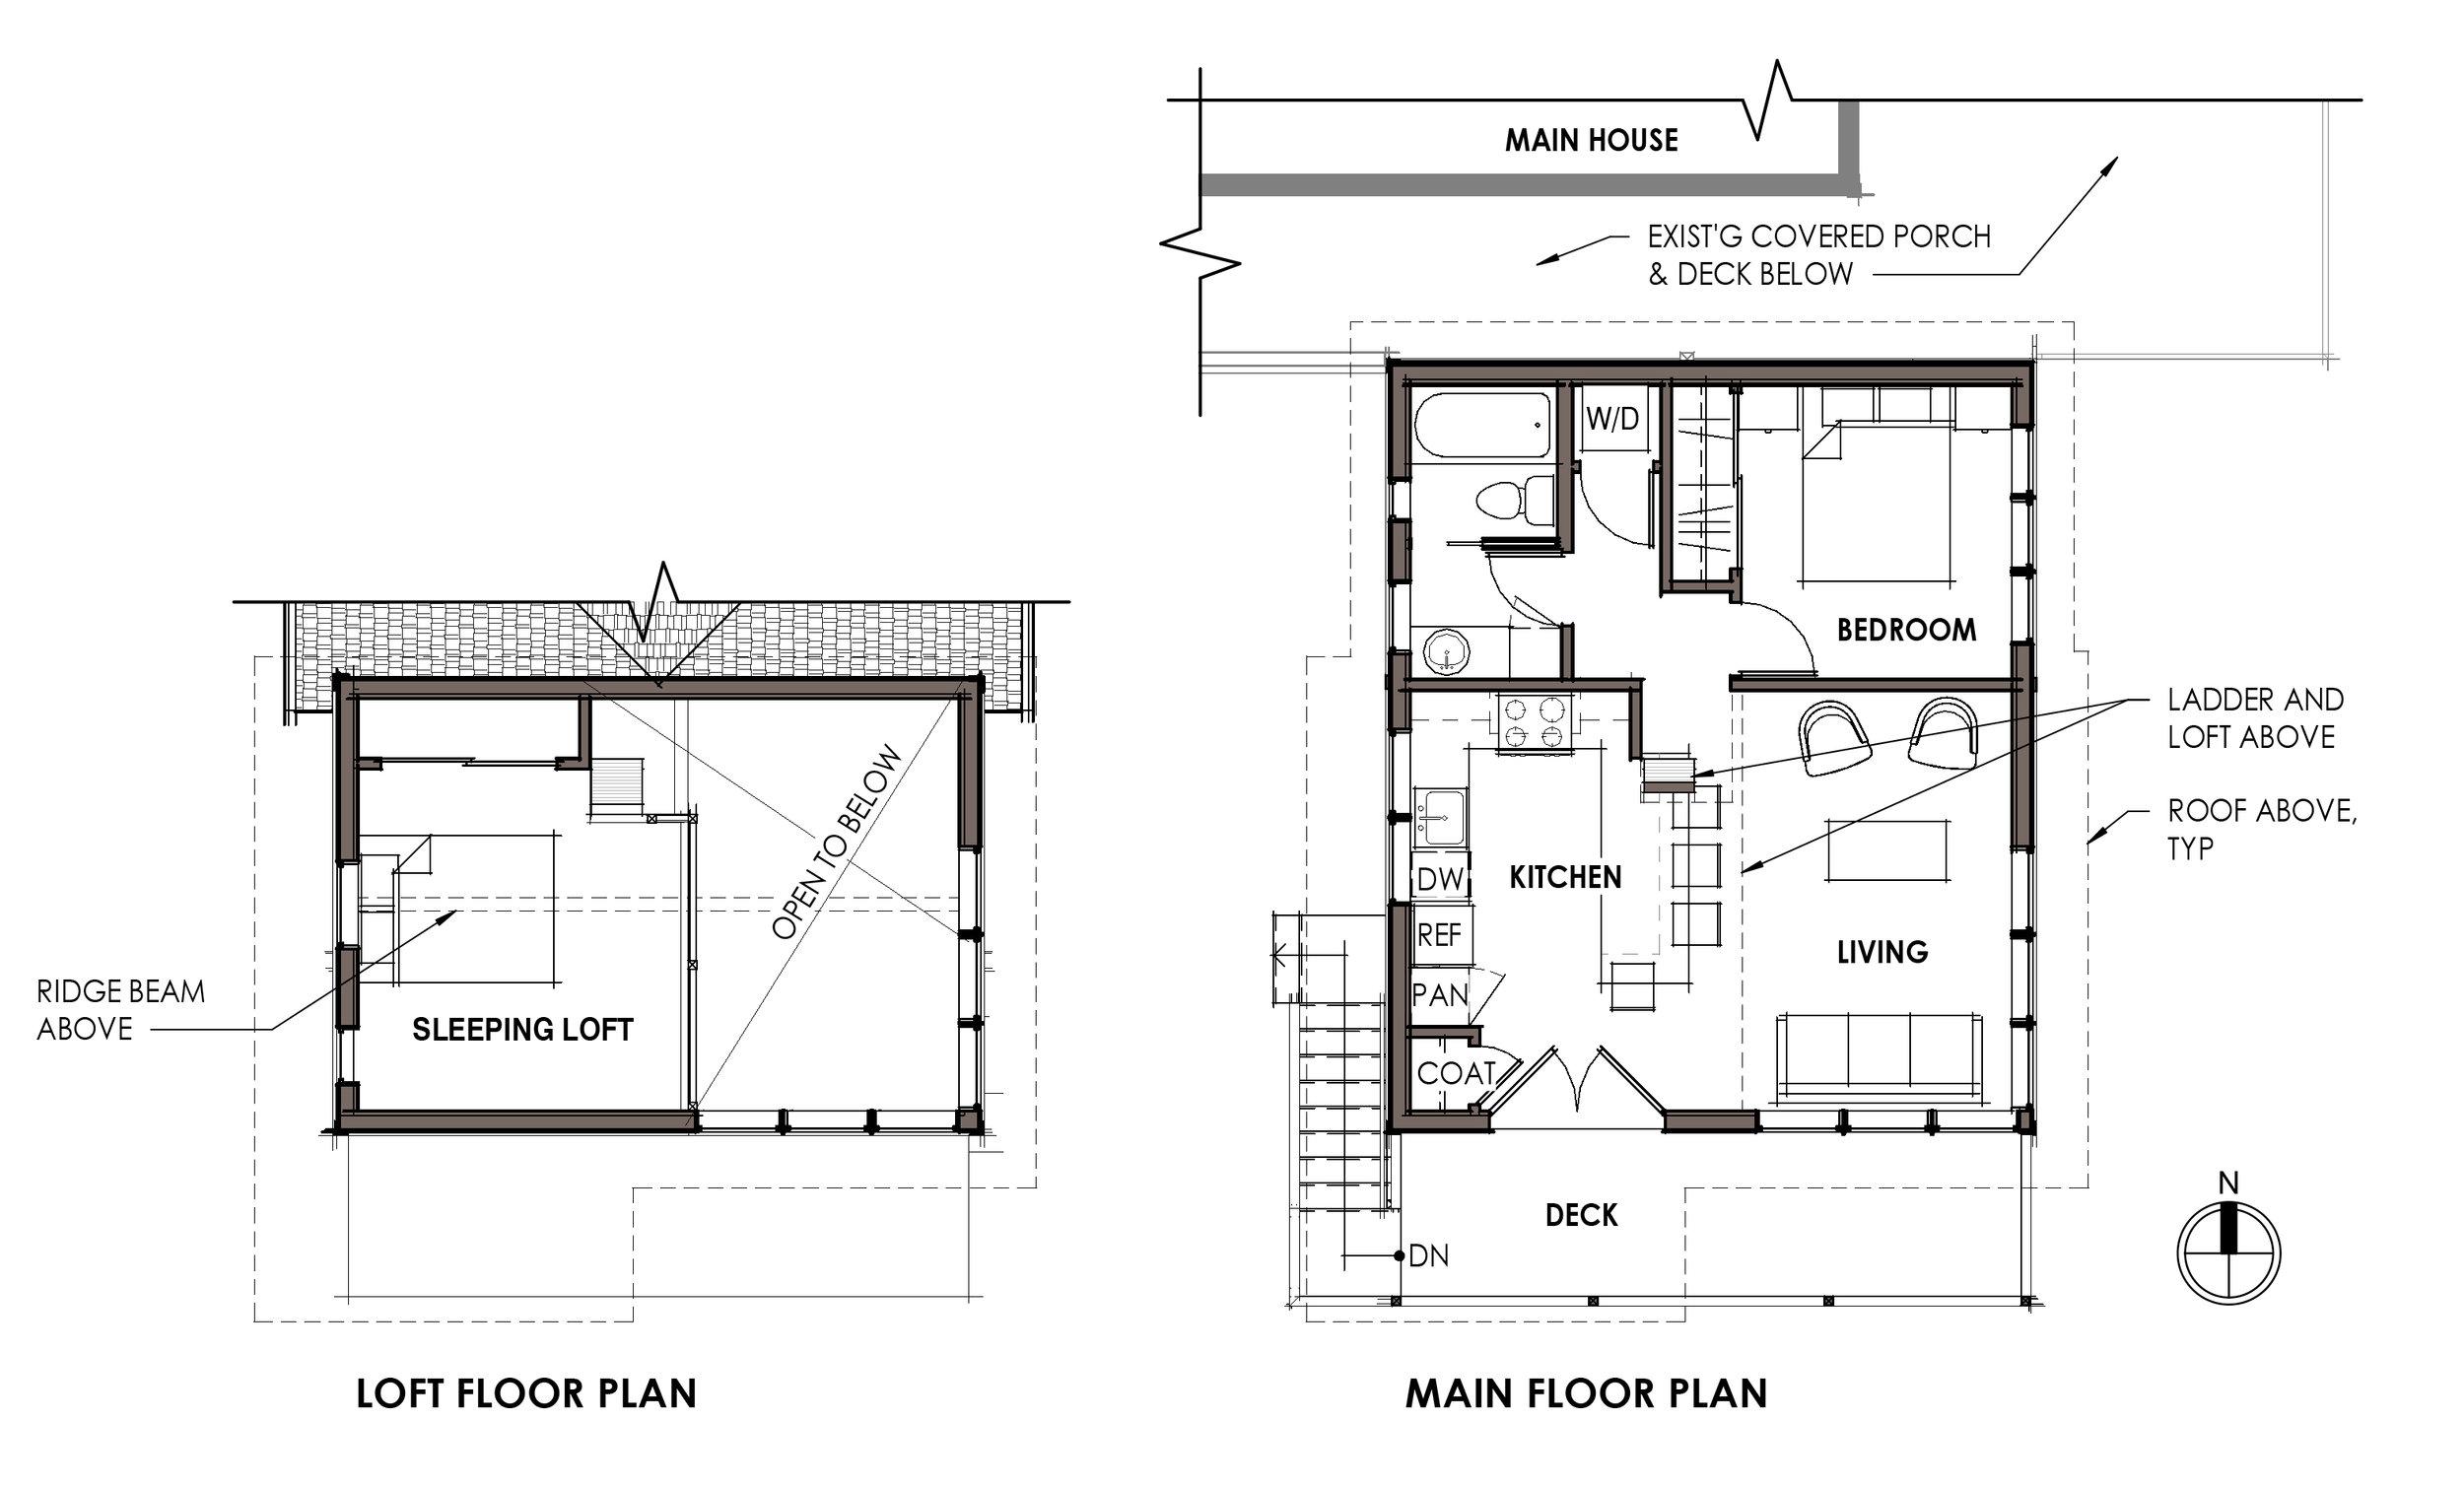 Harka_Architecture_Mt Tabor_ADU_Floor_Plan_Sleeping_Loft.jpg